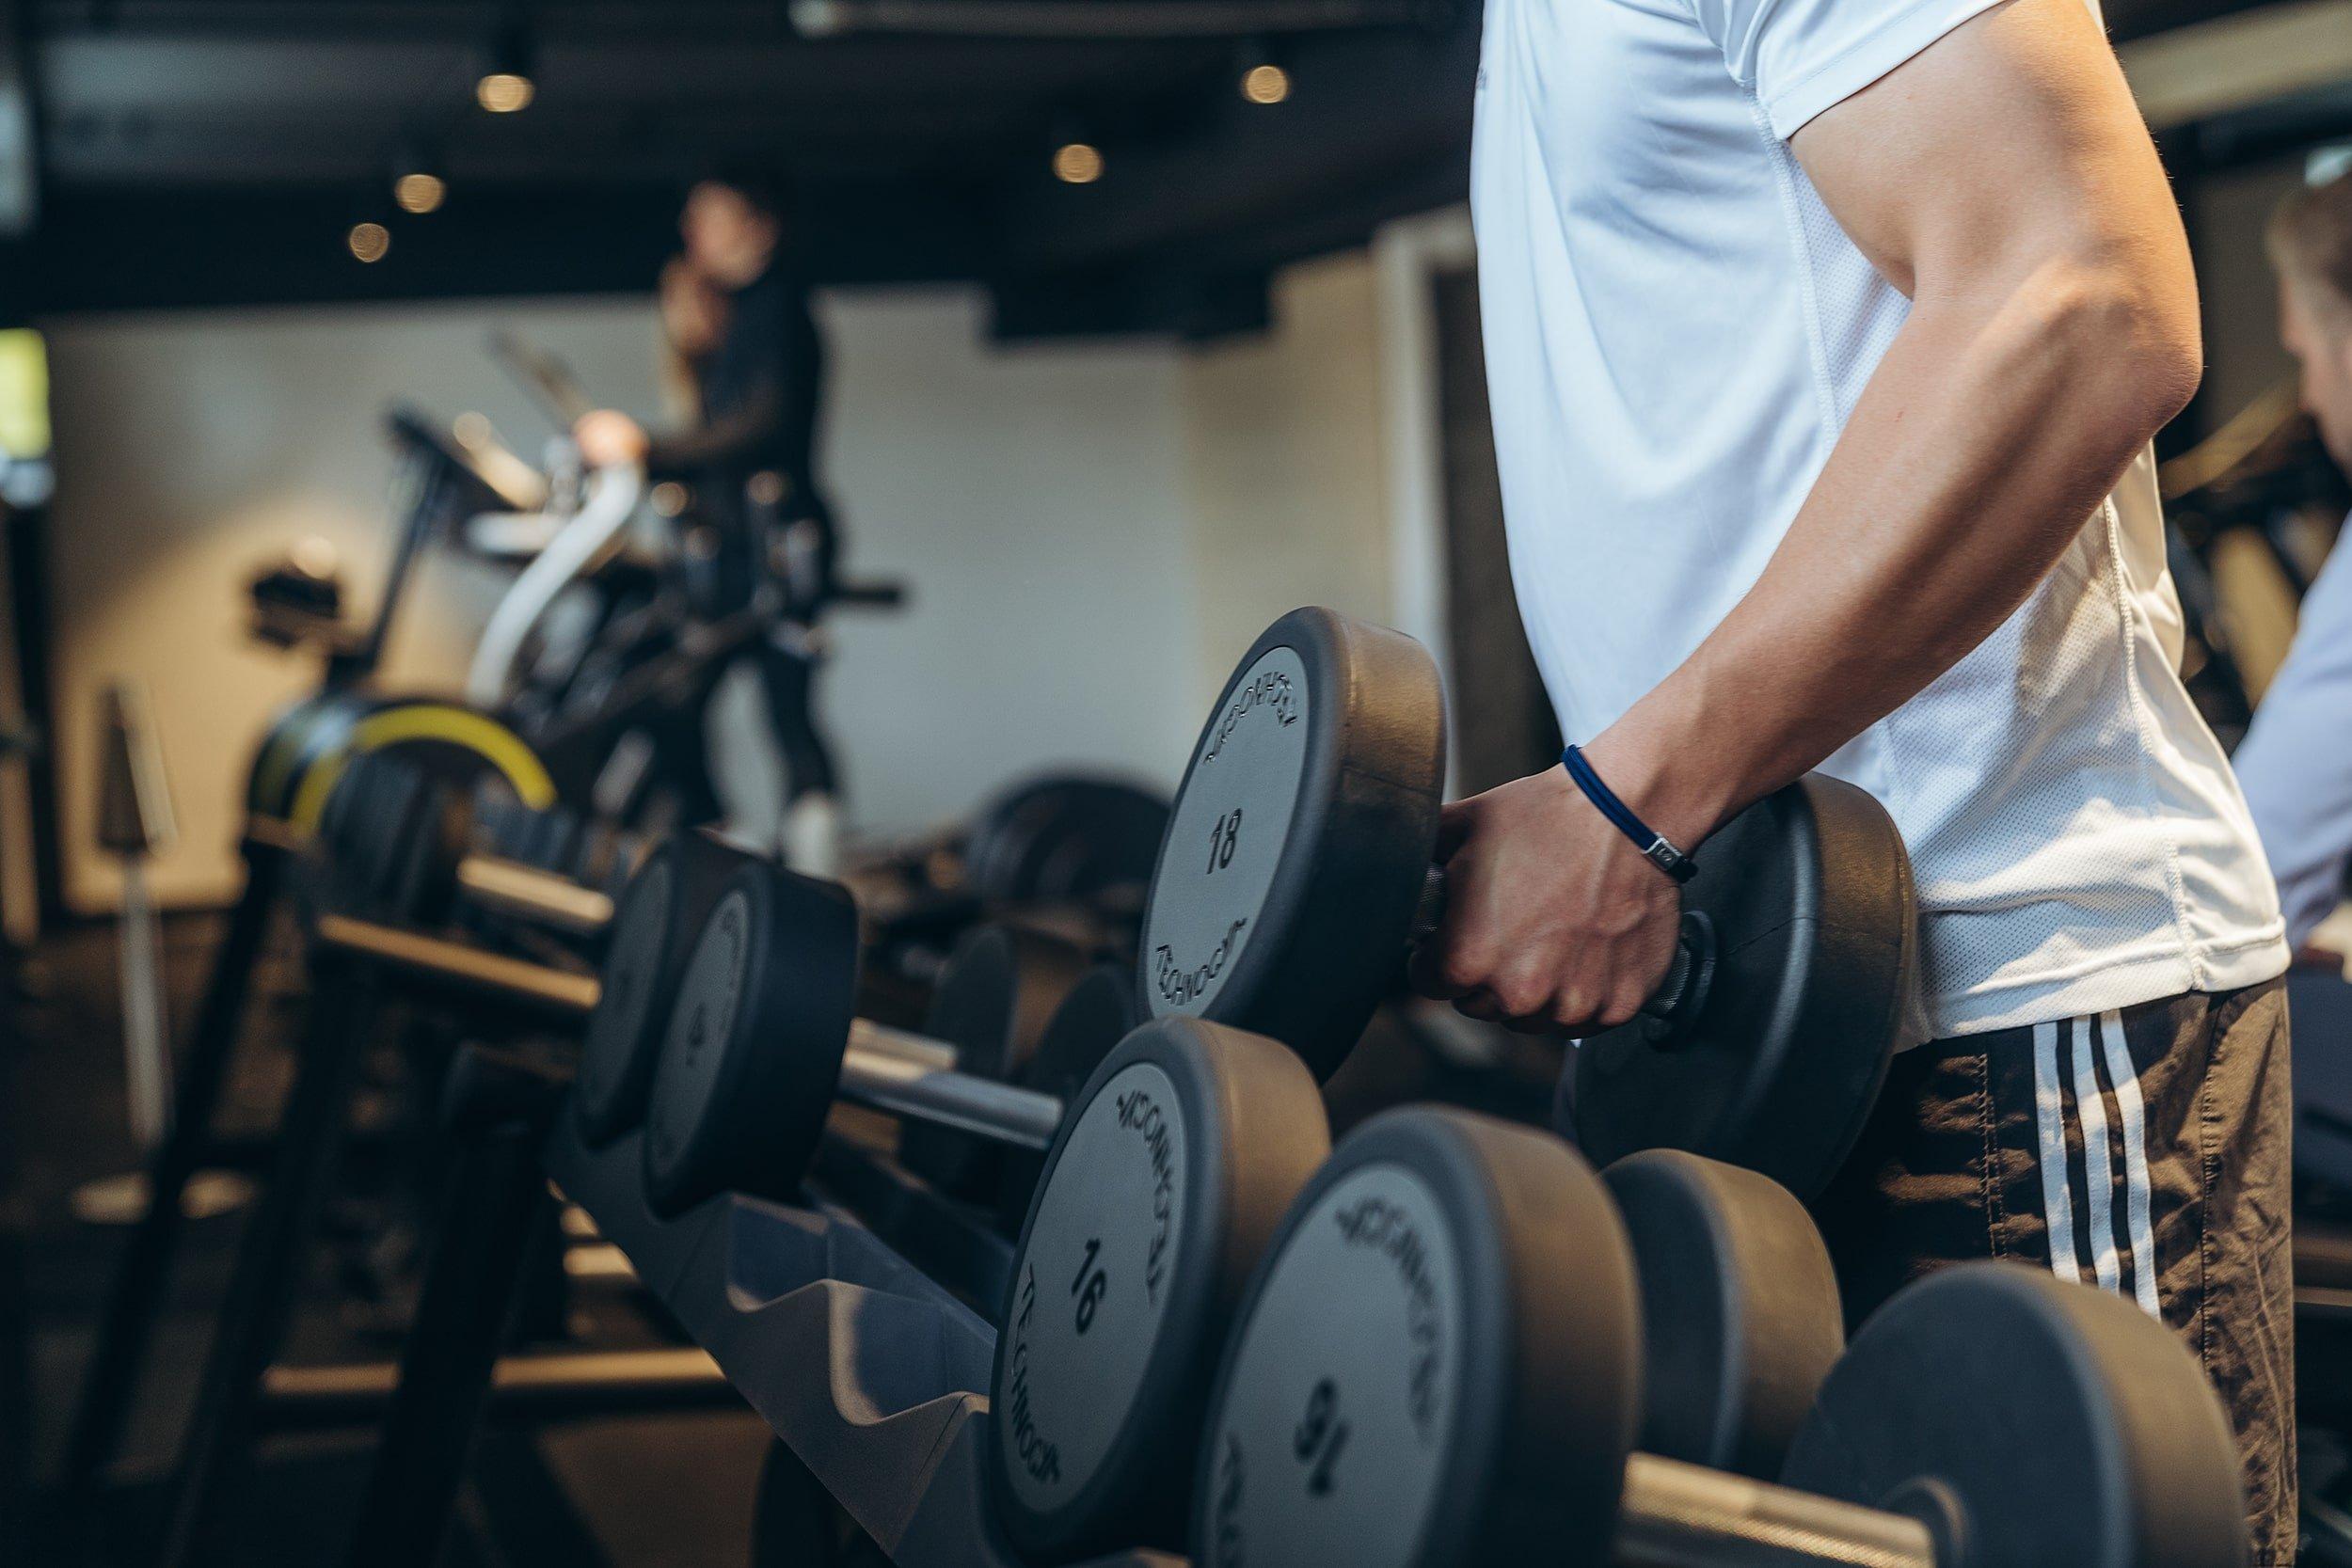 Fitness Area 056 min - Campus68